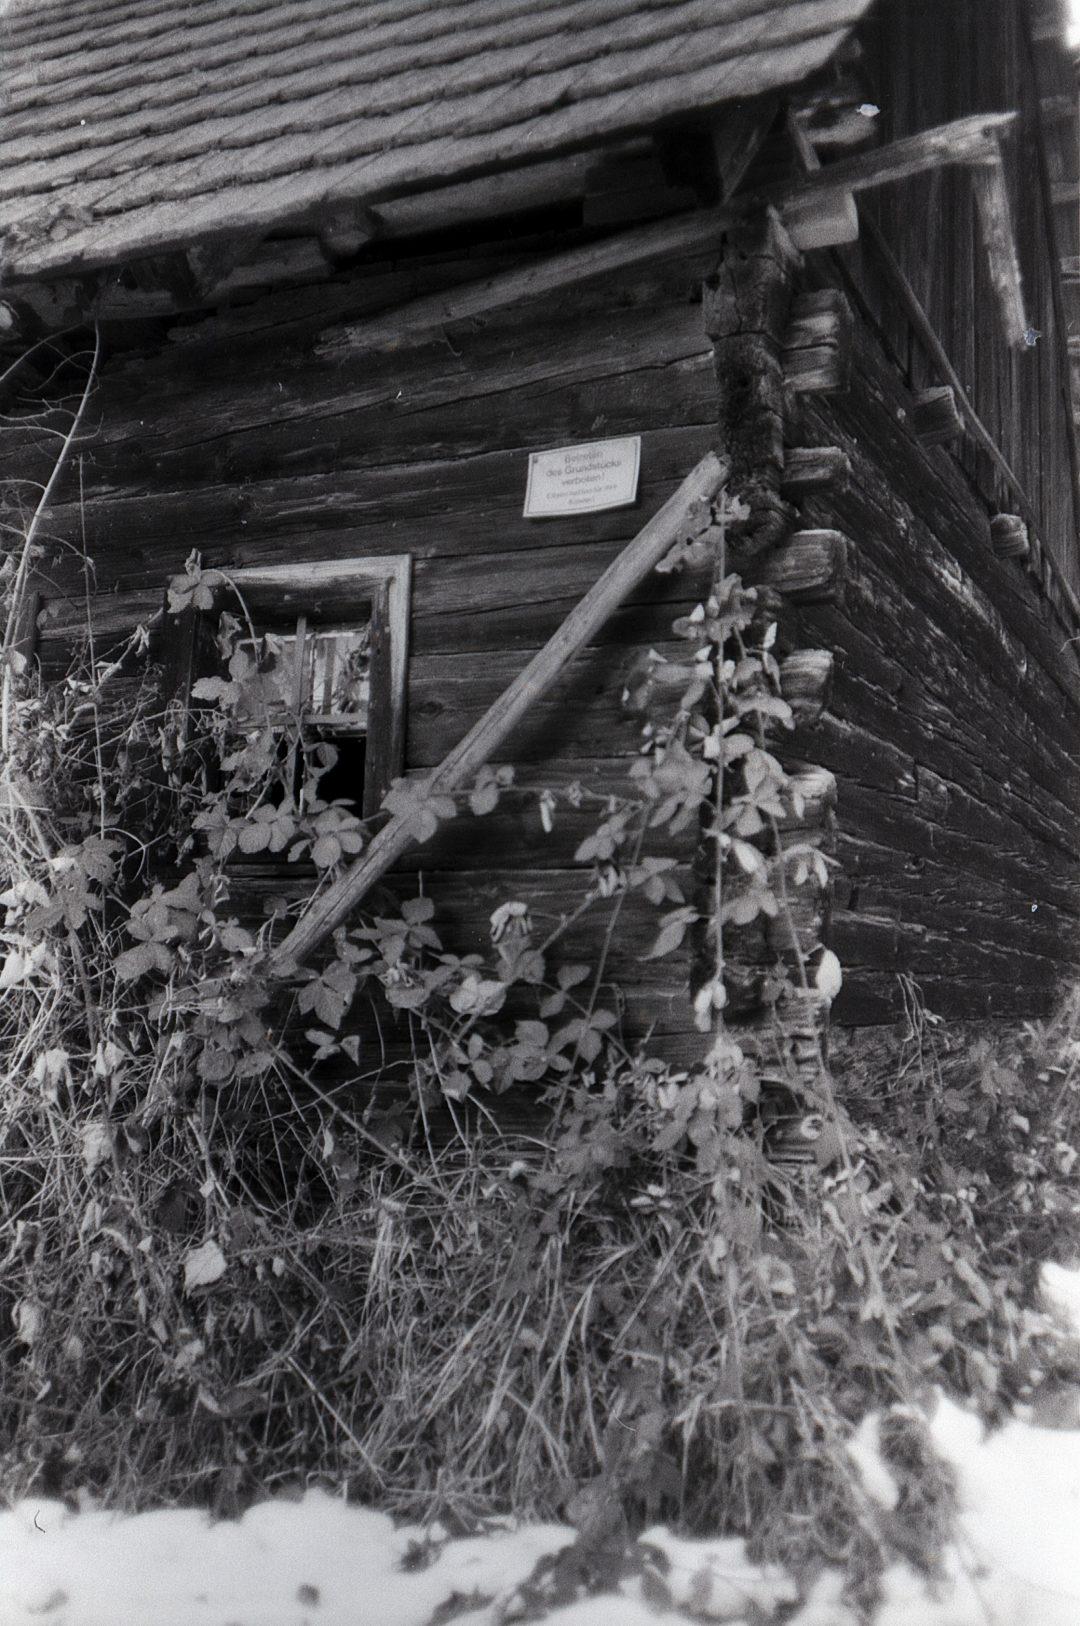 #025 Film per day - Falling apart barn #2